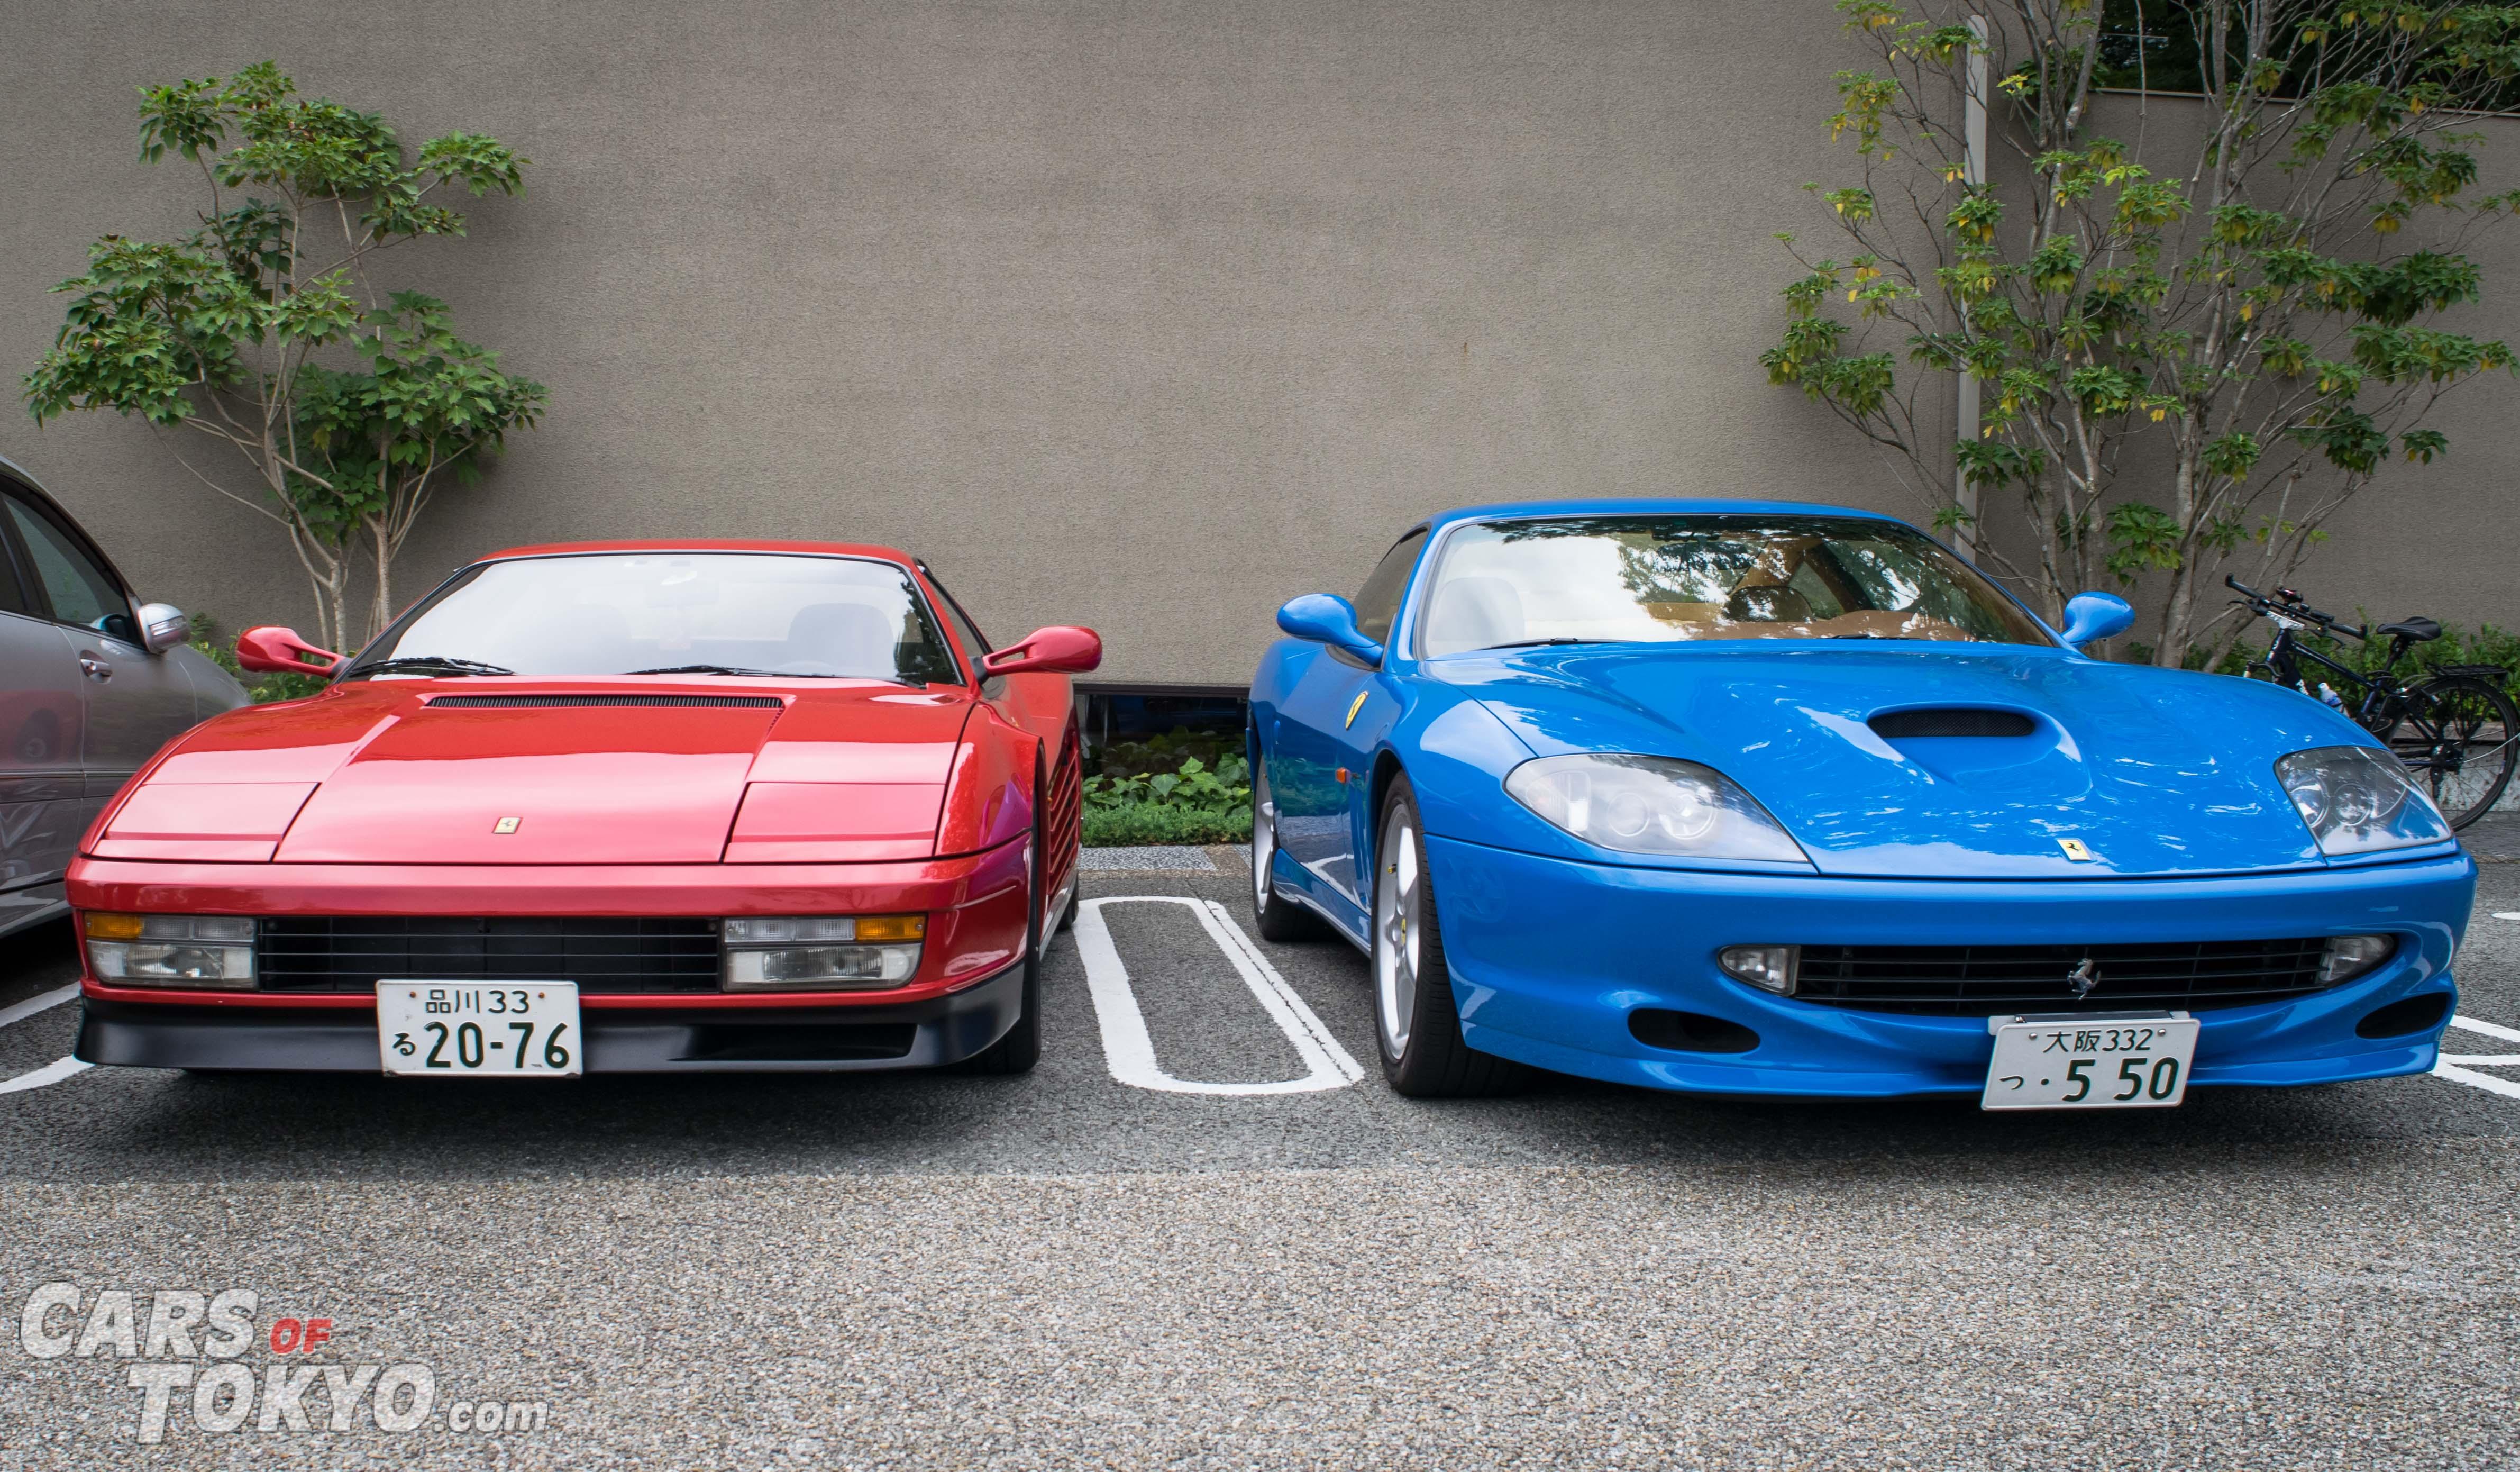 Cars of Tokyo Daikanyama Ferrari Testarossa & 550 Maranello